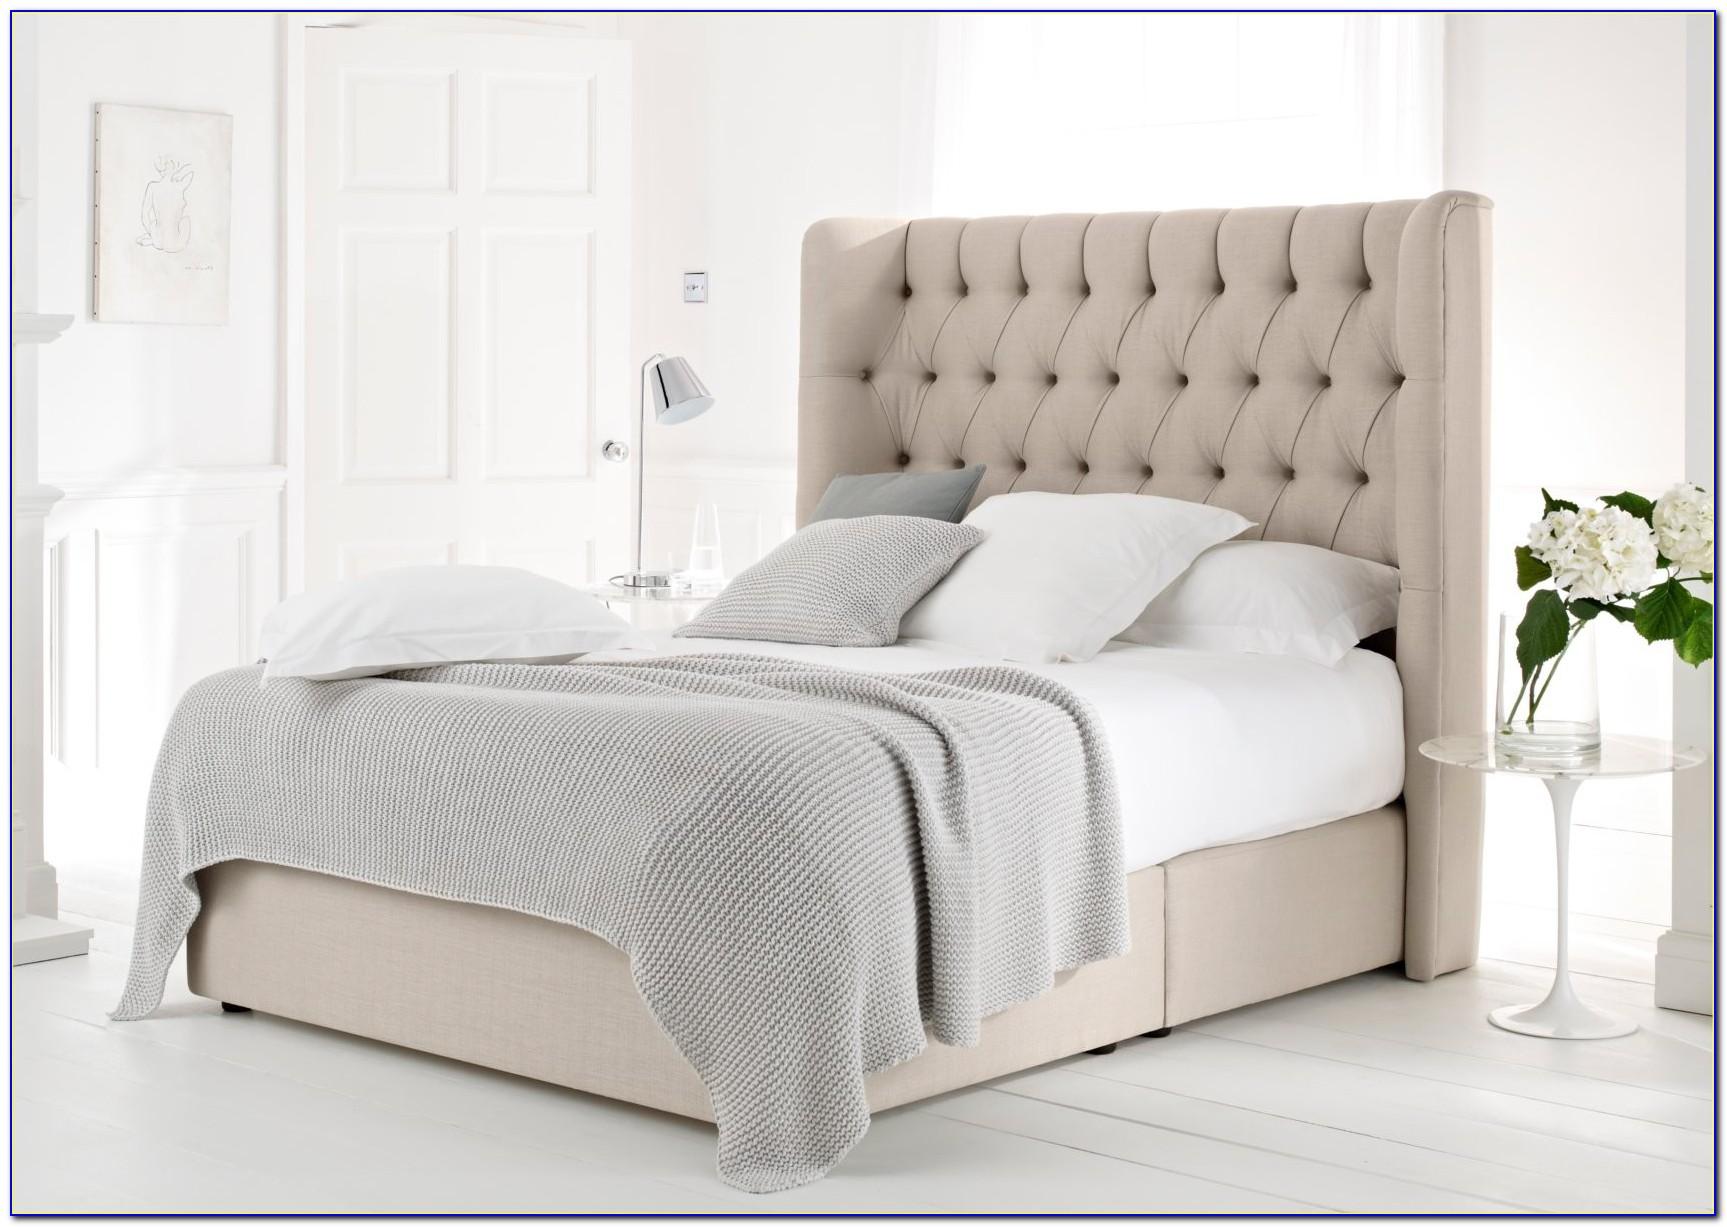 Sleigh Bed Headboard King Size